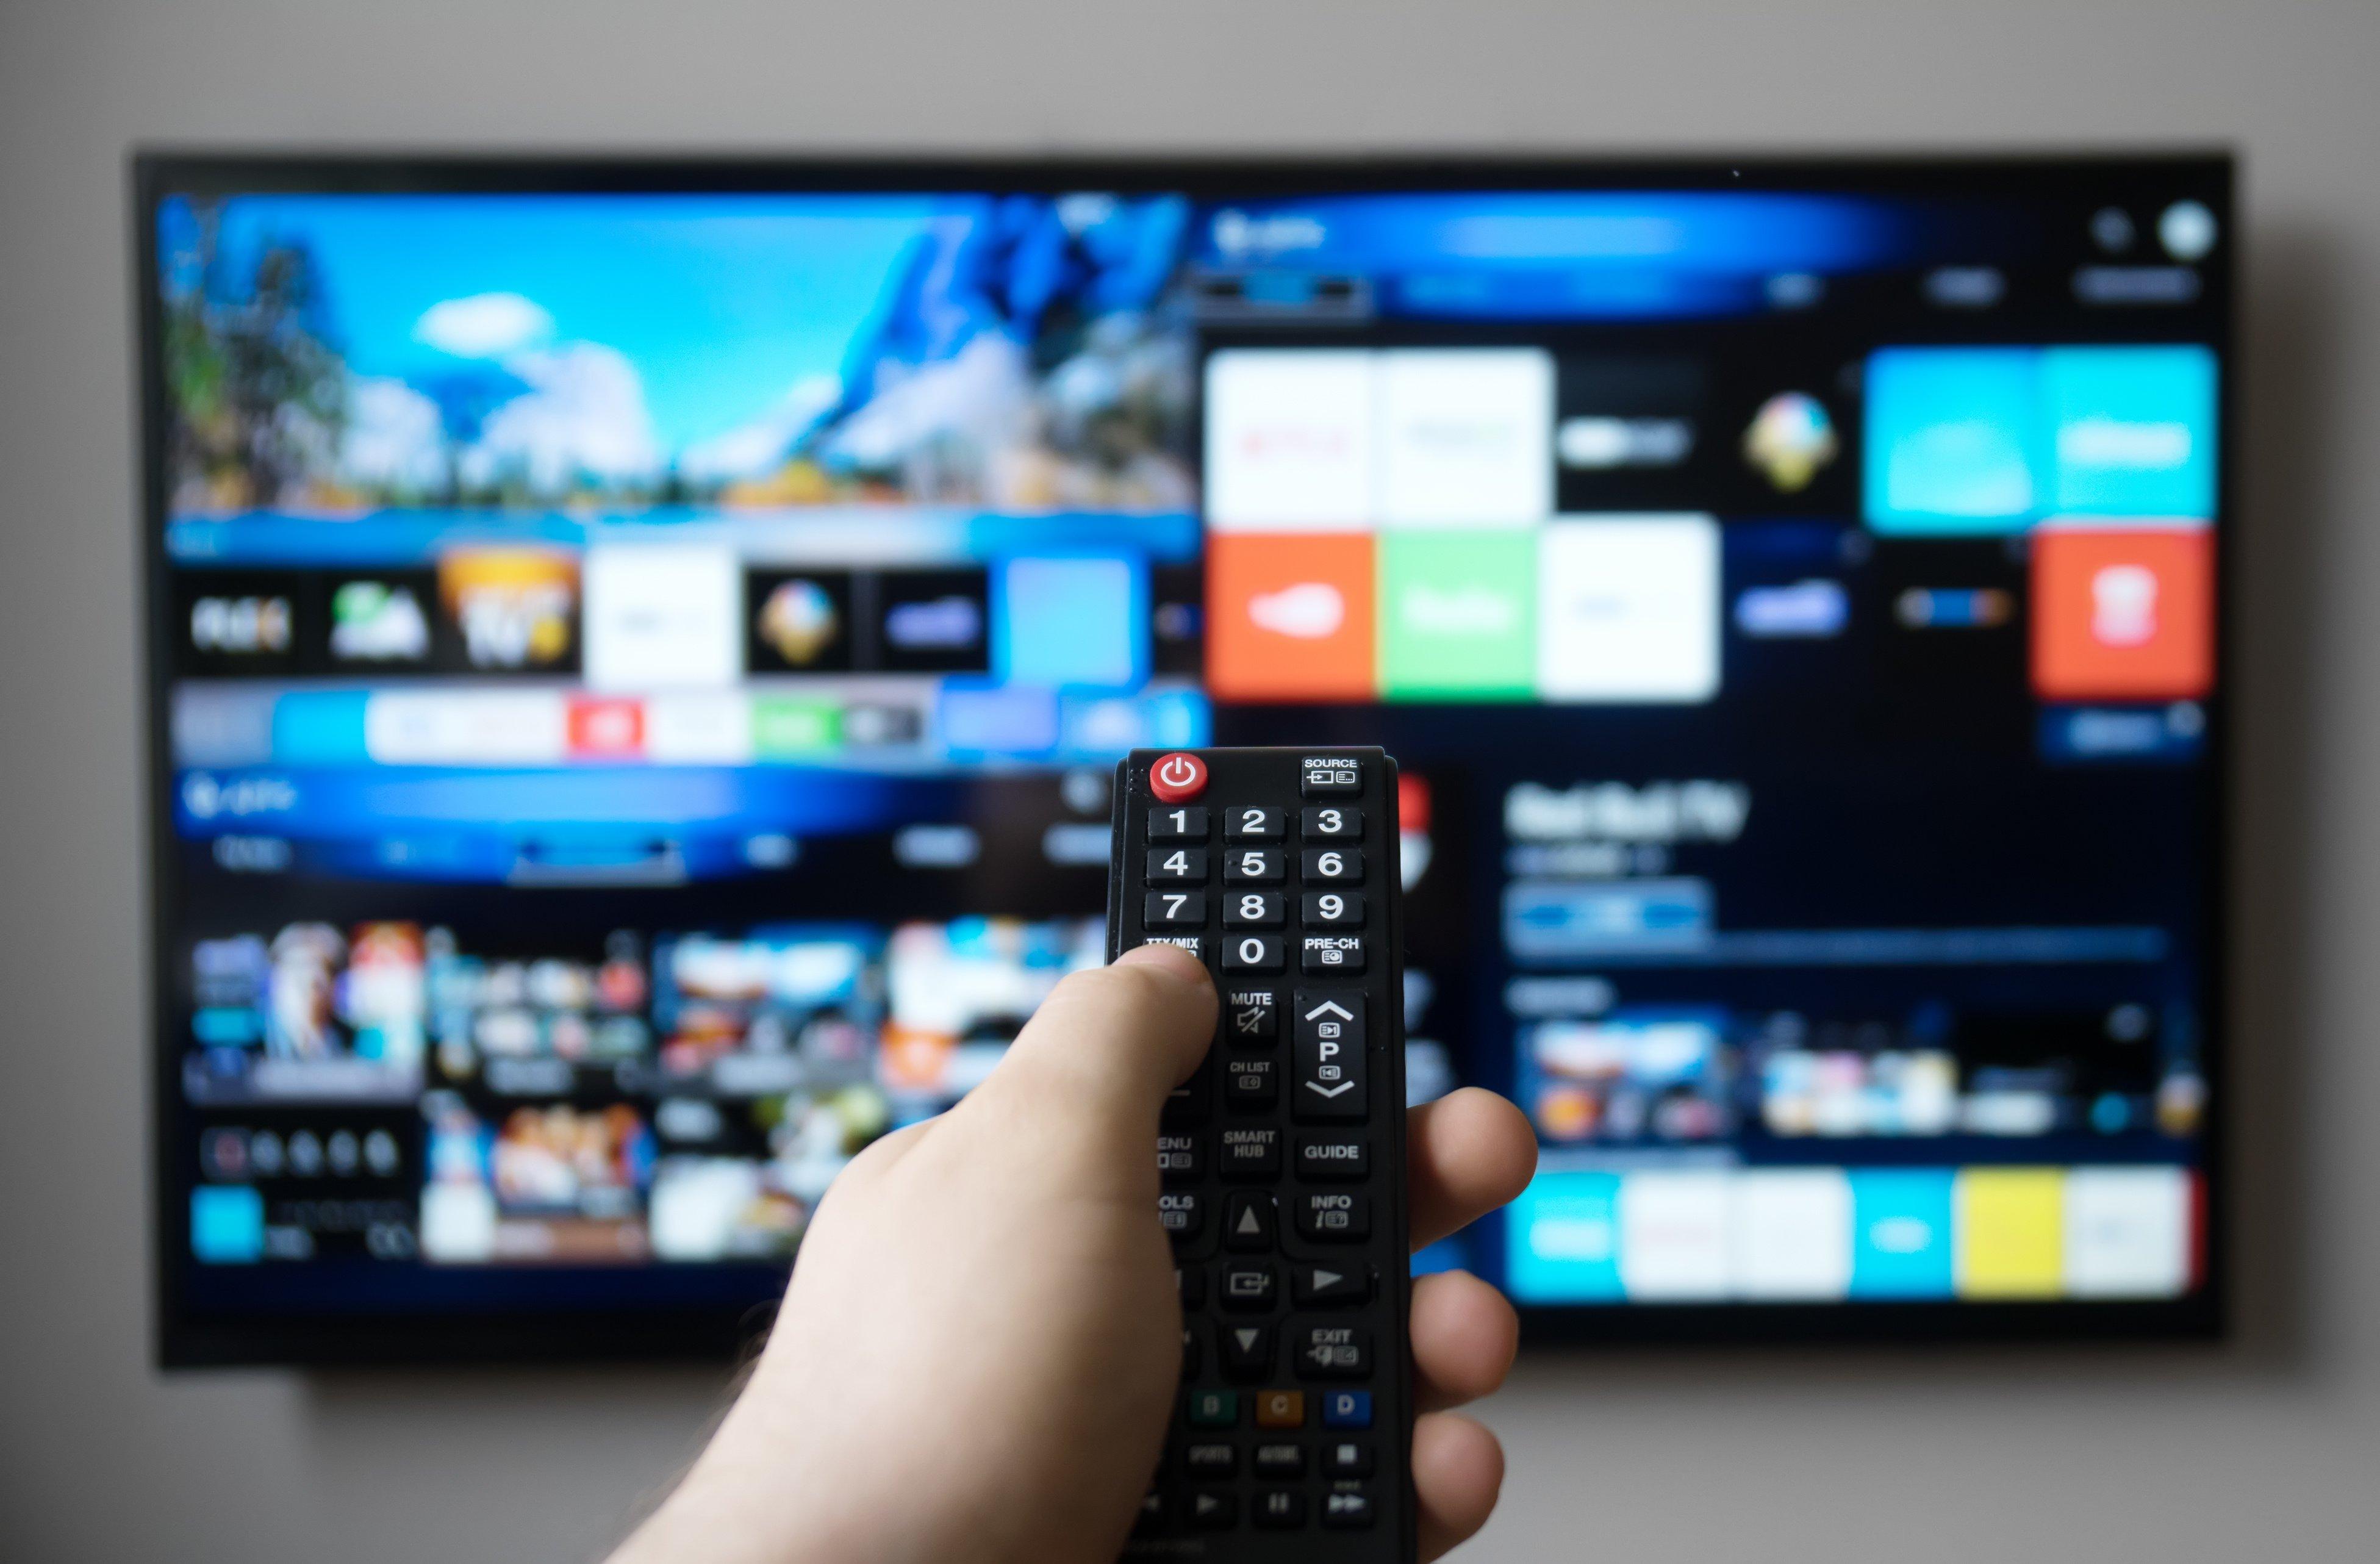 Smart TV image